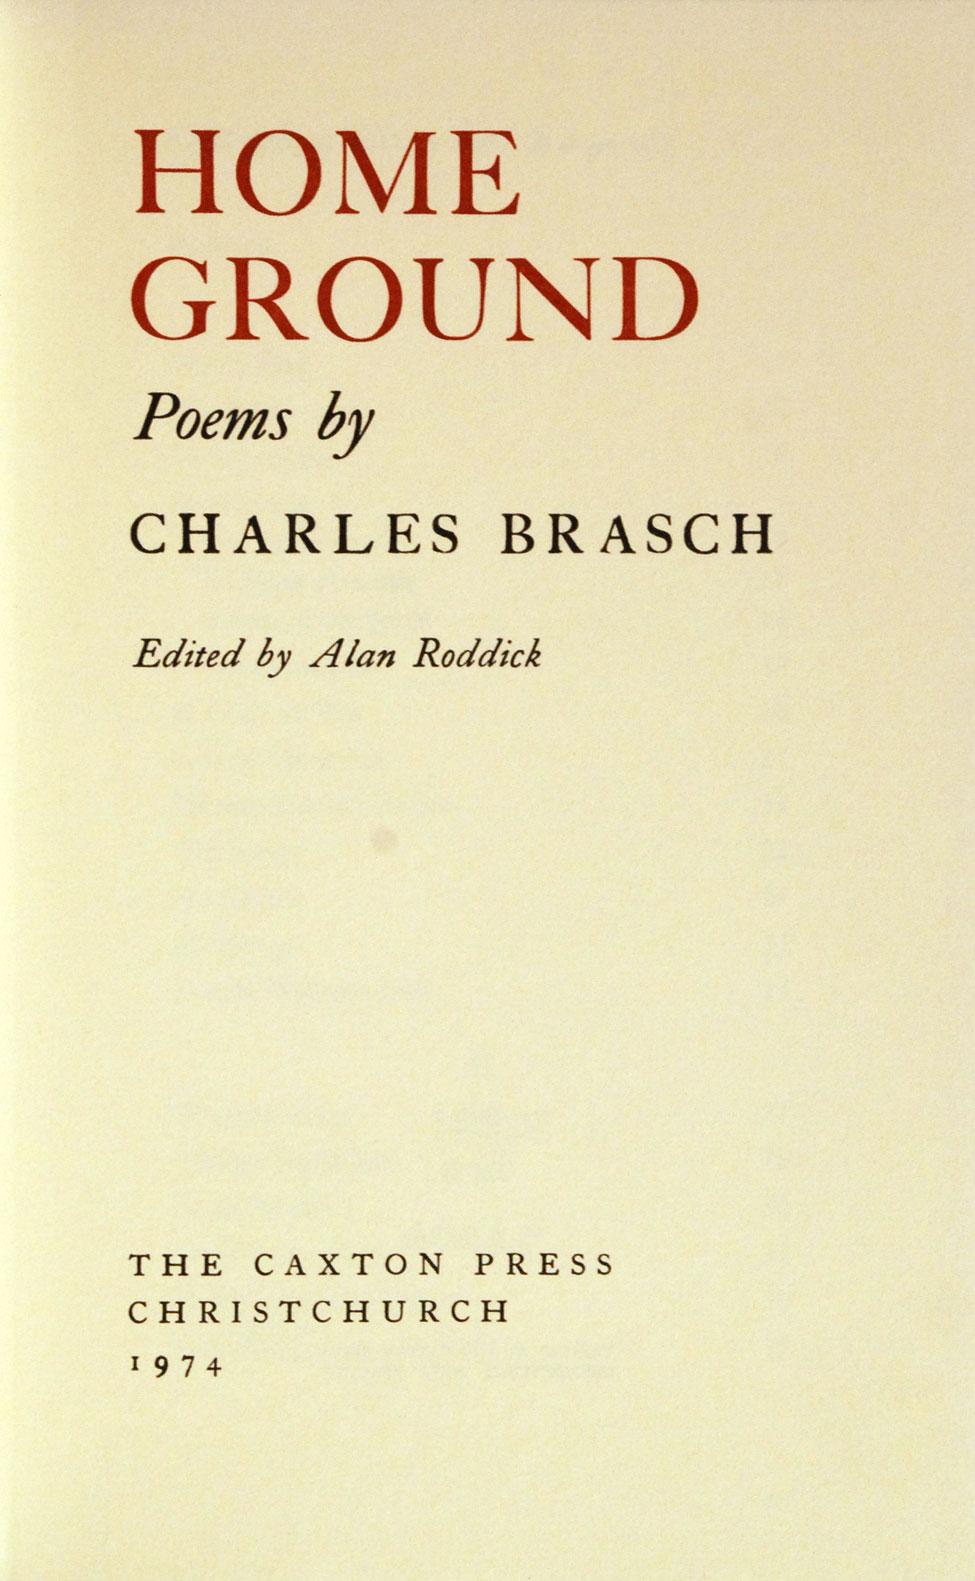 Alan Roddick (ed.). Home Ground: Poems by Charles Brasch. <i>Christchurch: The Caxton Press, 1974.</i>